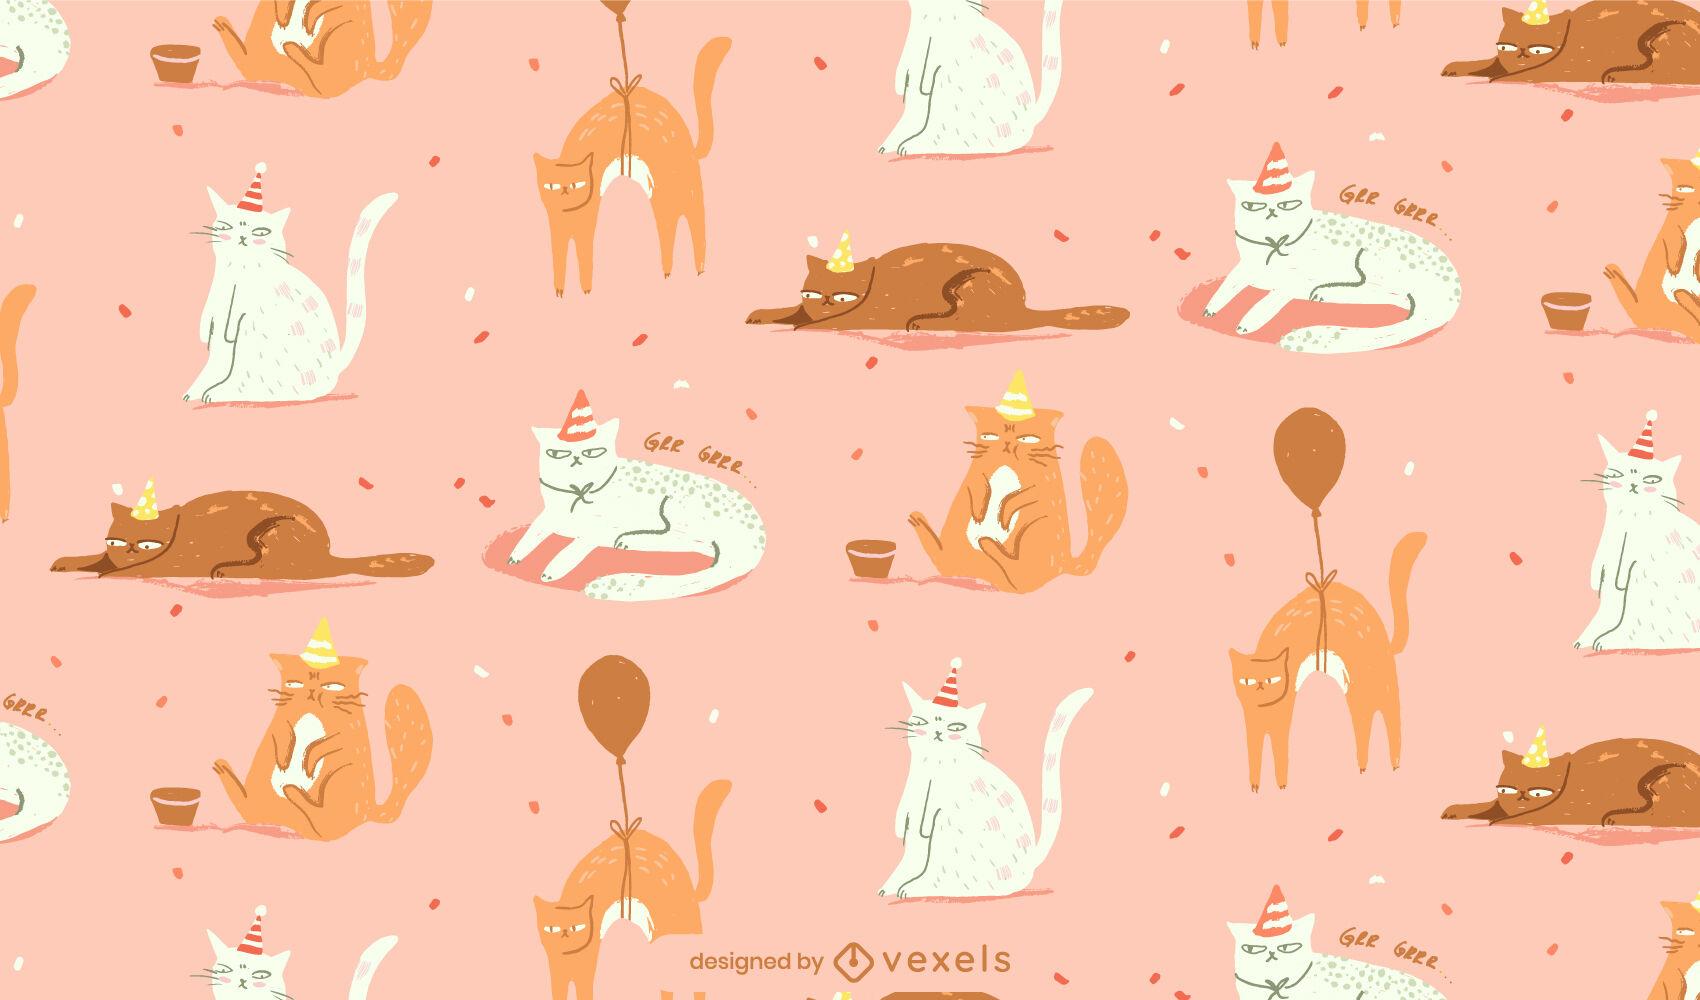 Grumpy cats illustration pattern